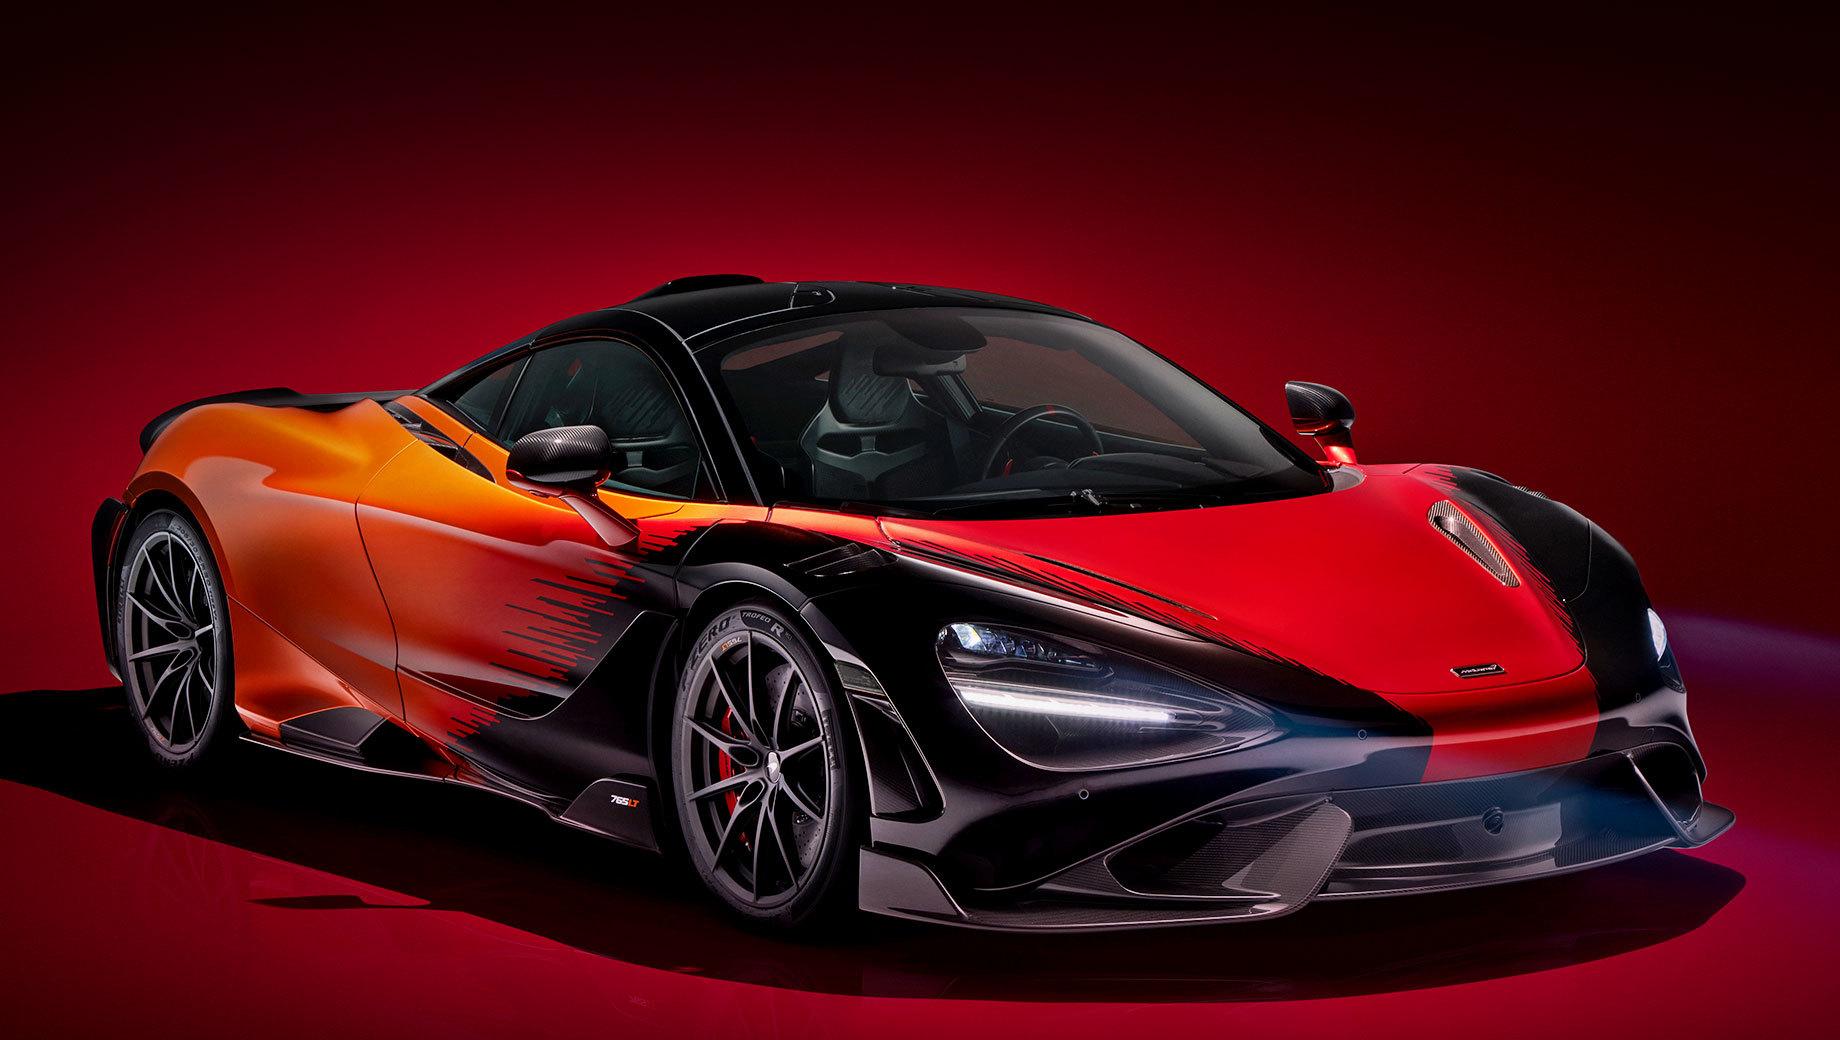 McLaren 765LT Strata Theme by MSO отличился окраской